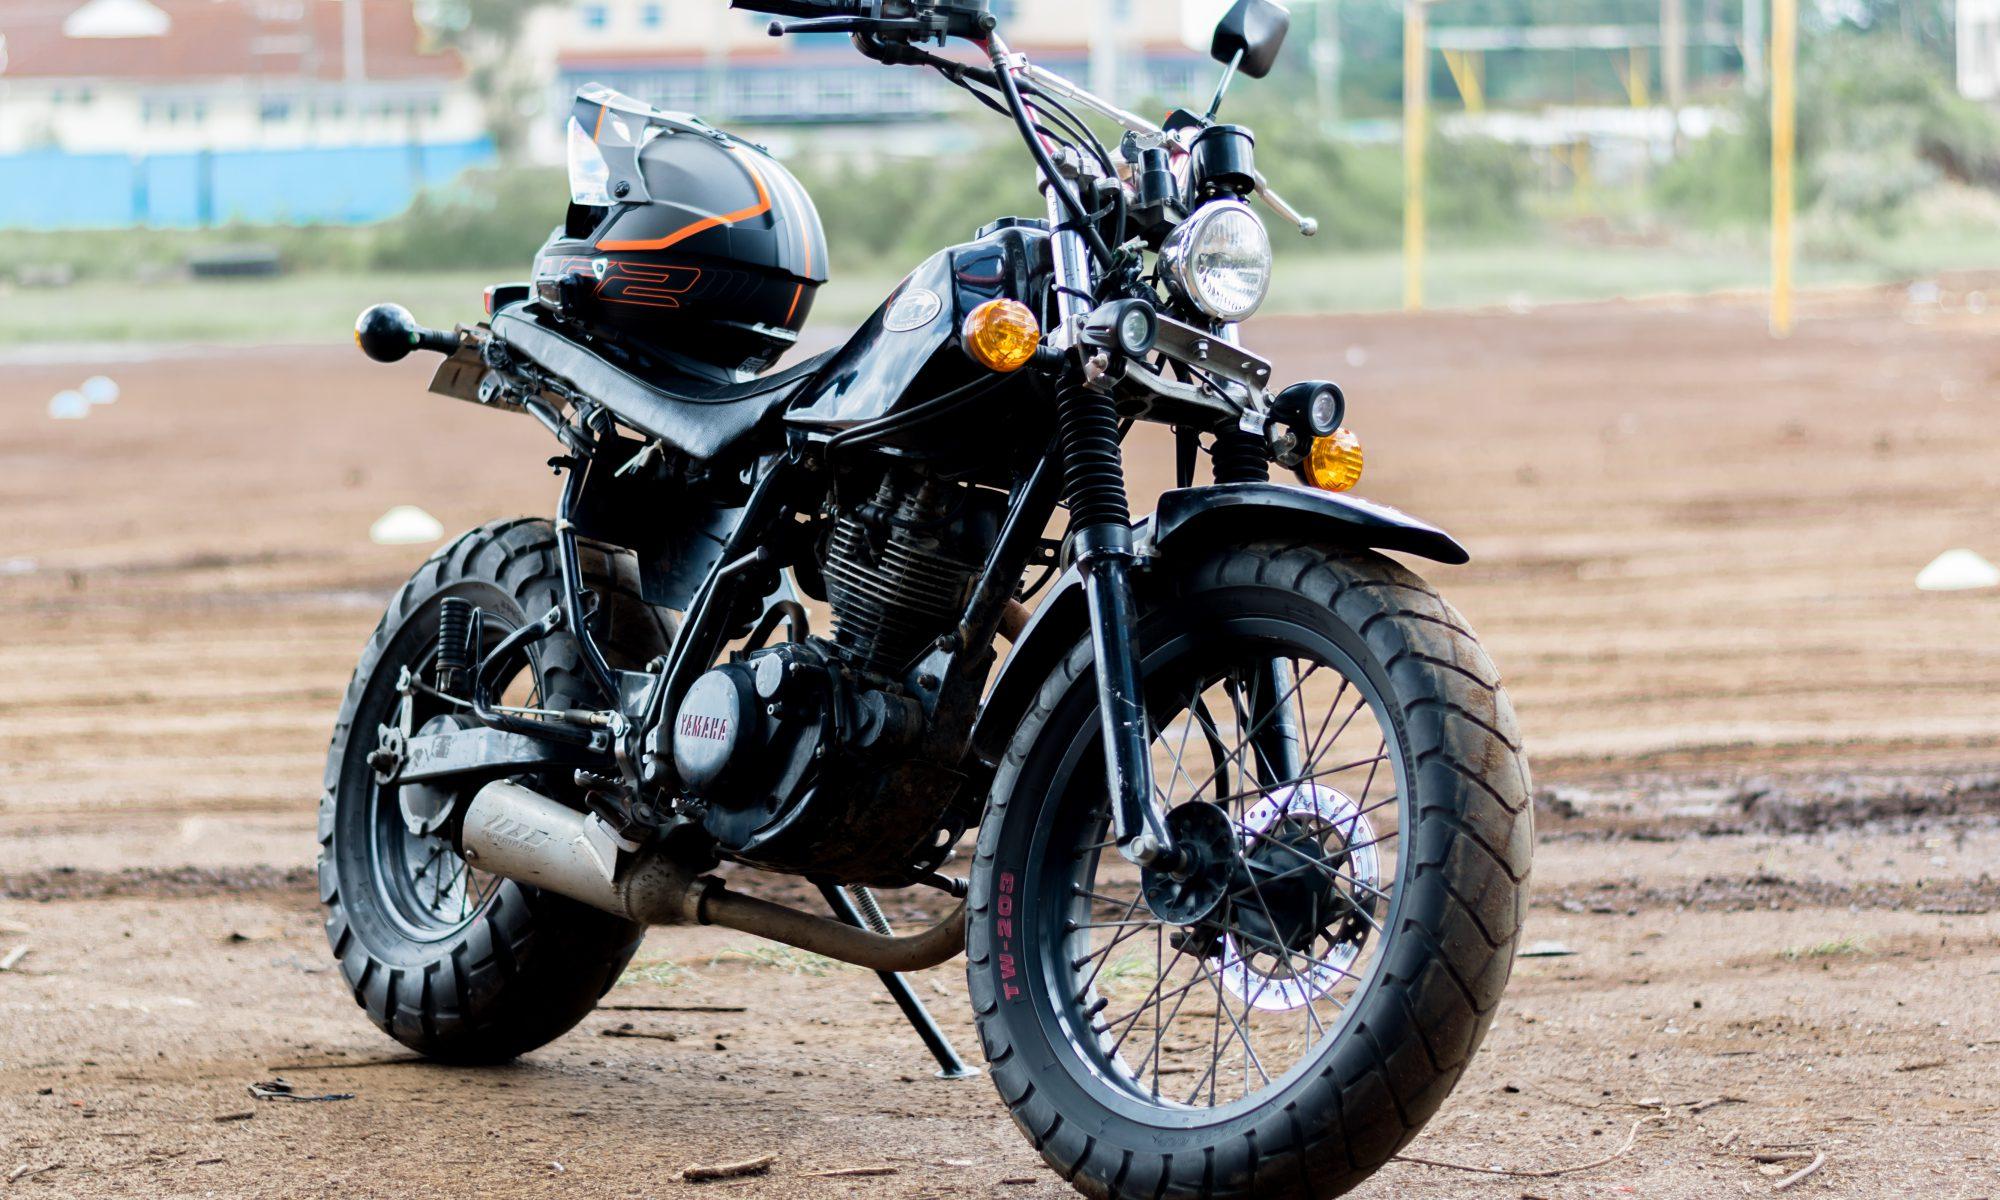 InkedBiker Rider Training